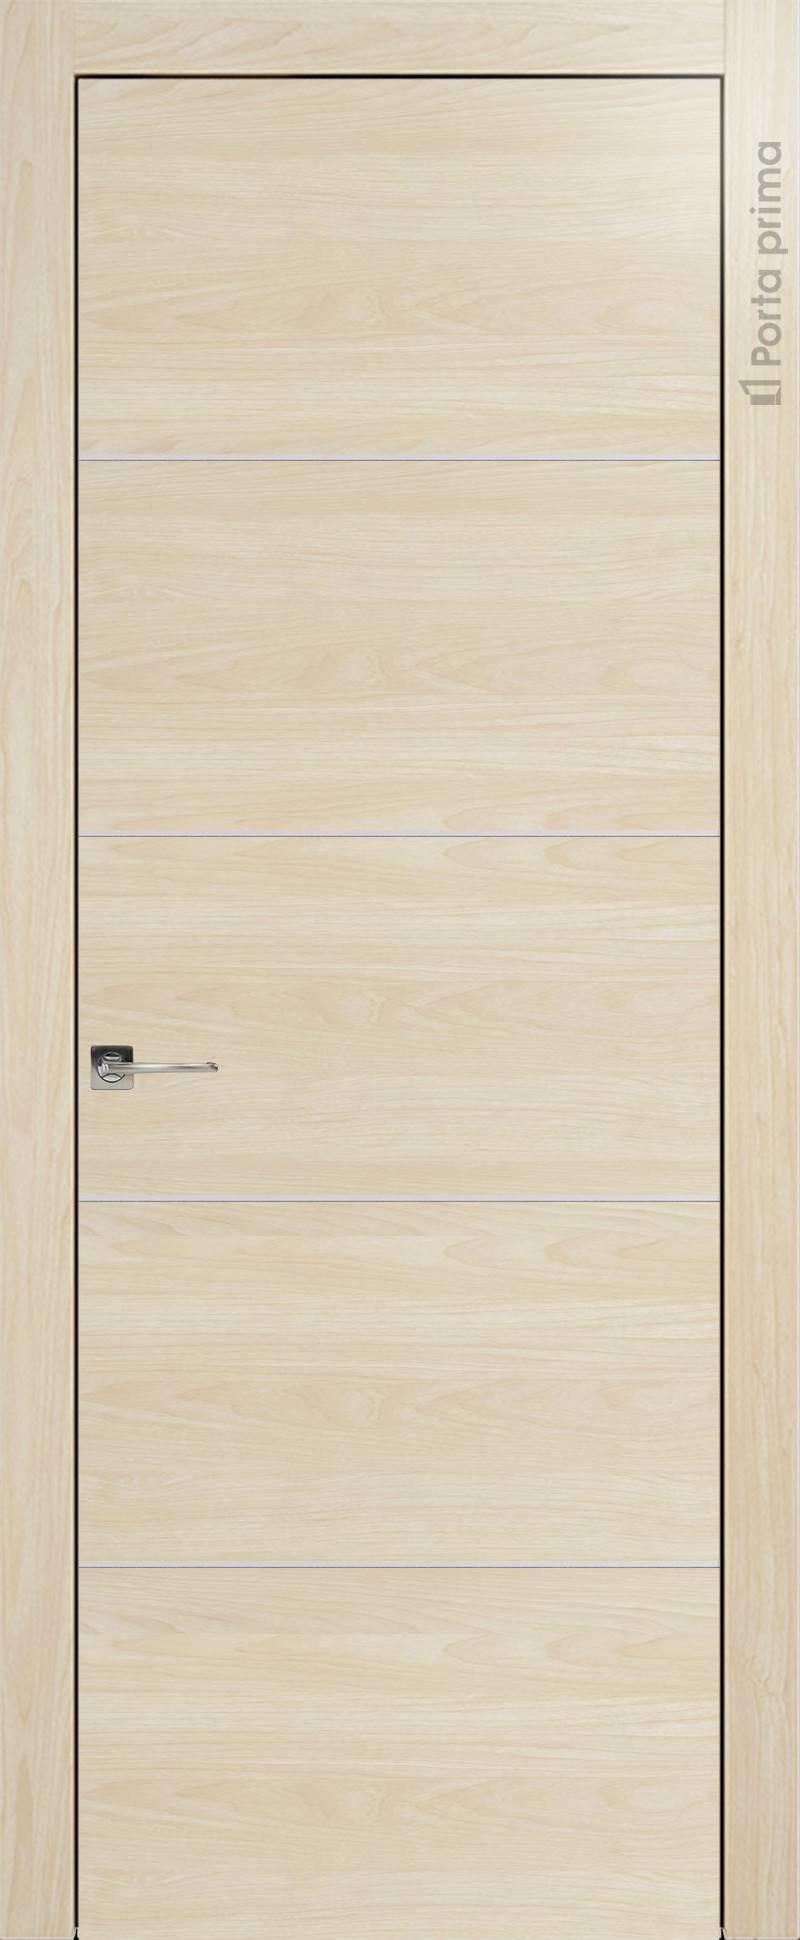 Tivoli Д-3 цвет - Клен Без стекла (ДГ)